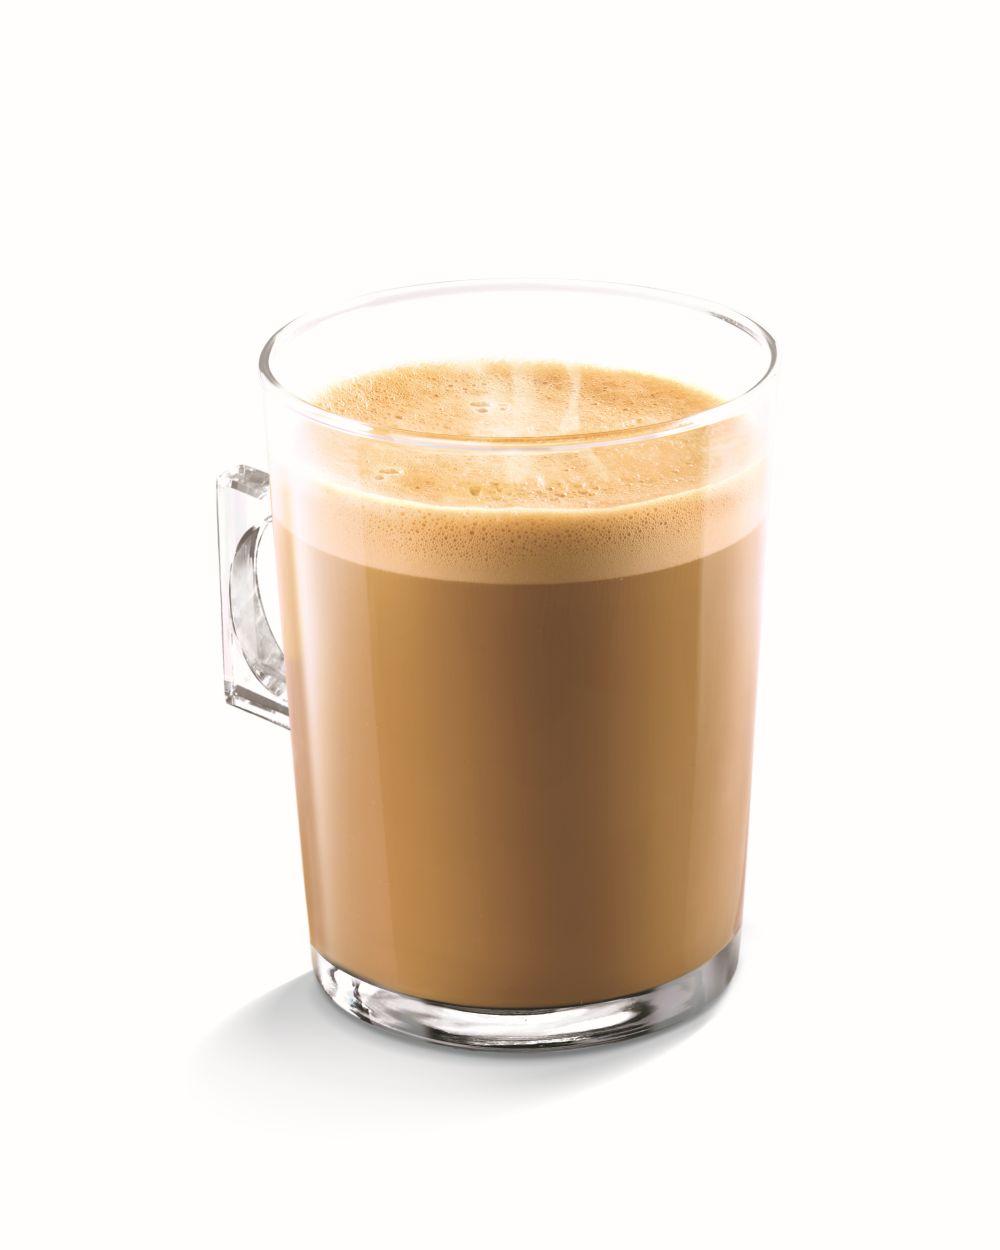 nescafe dolce gusto cafe au lait 16 coffee pods capsules. Black Bedroom Furniture Sets. Home Design Ideas